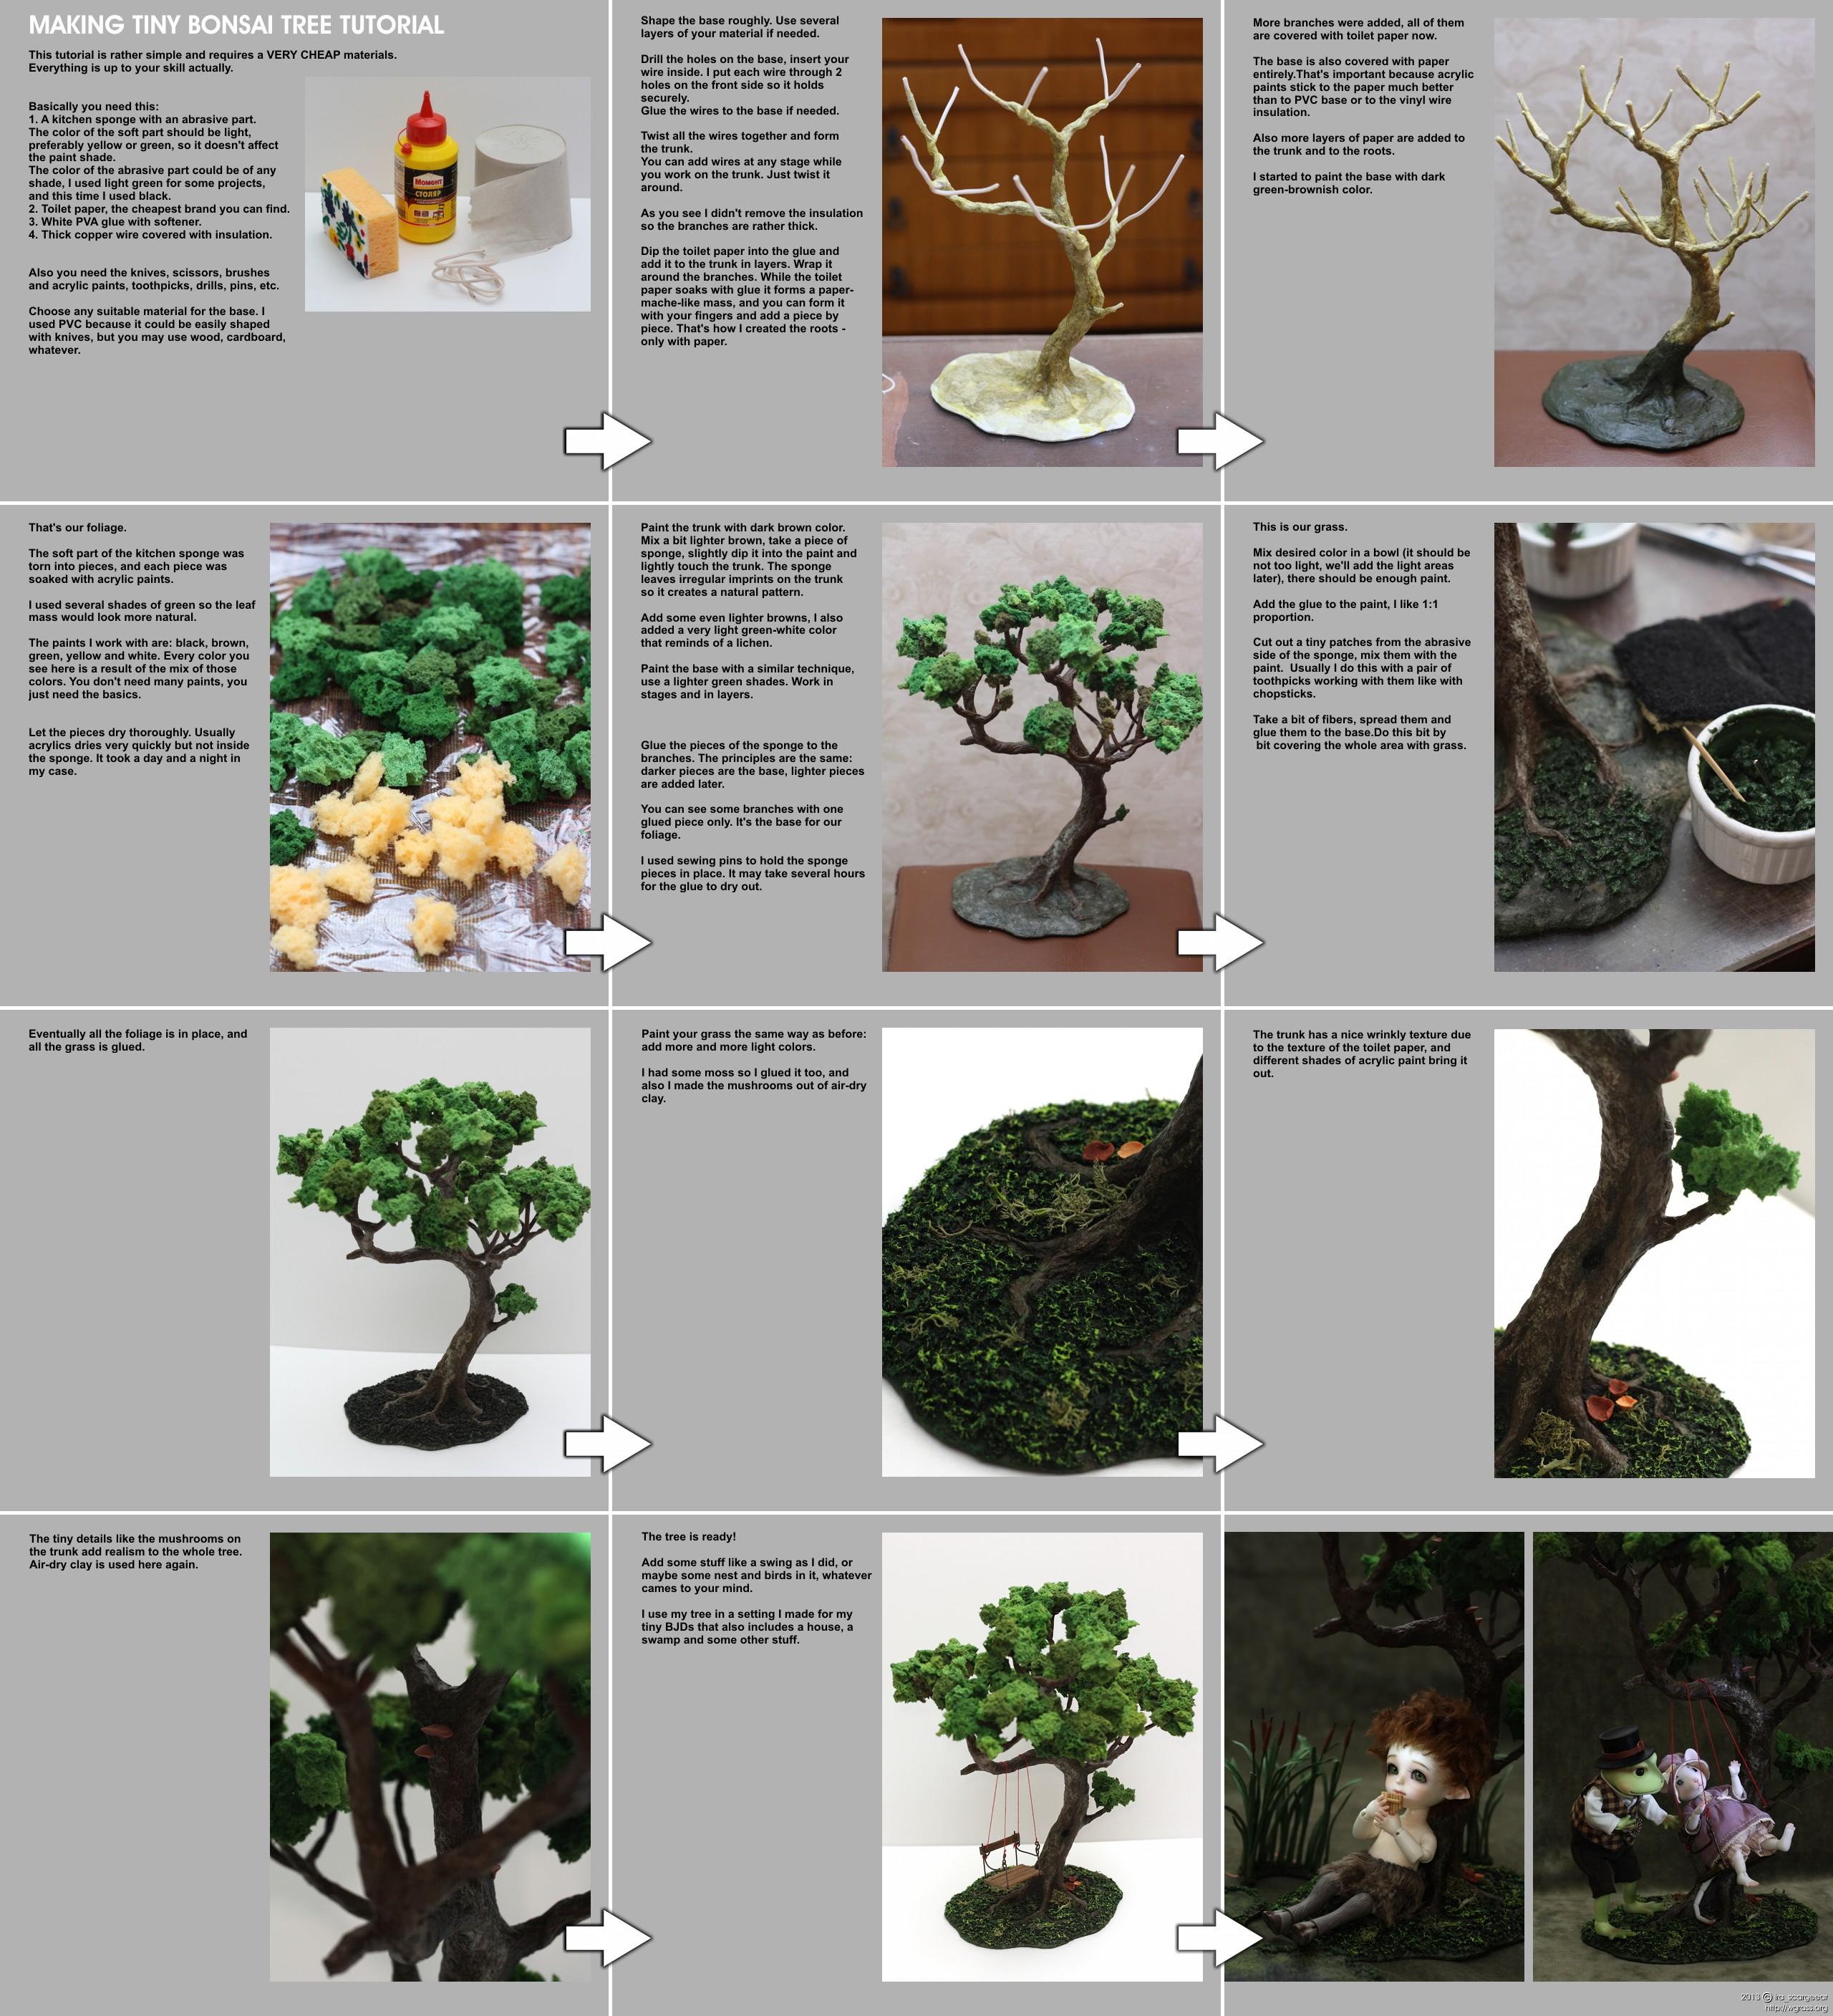 Making Tiny Bonsai Tree Tutorial By Scargeear On Deviantart